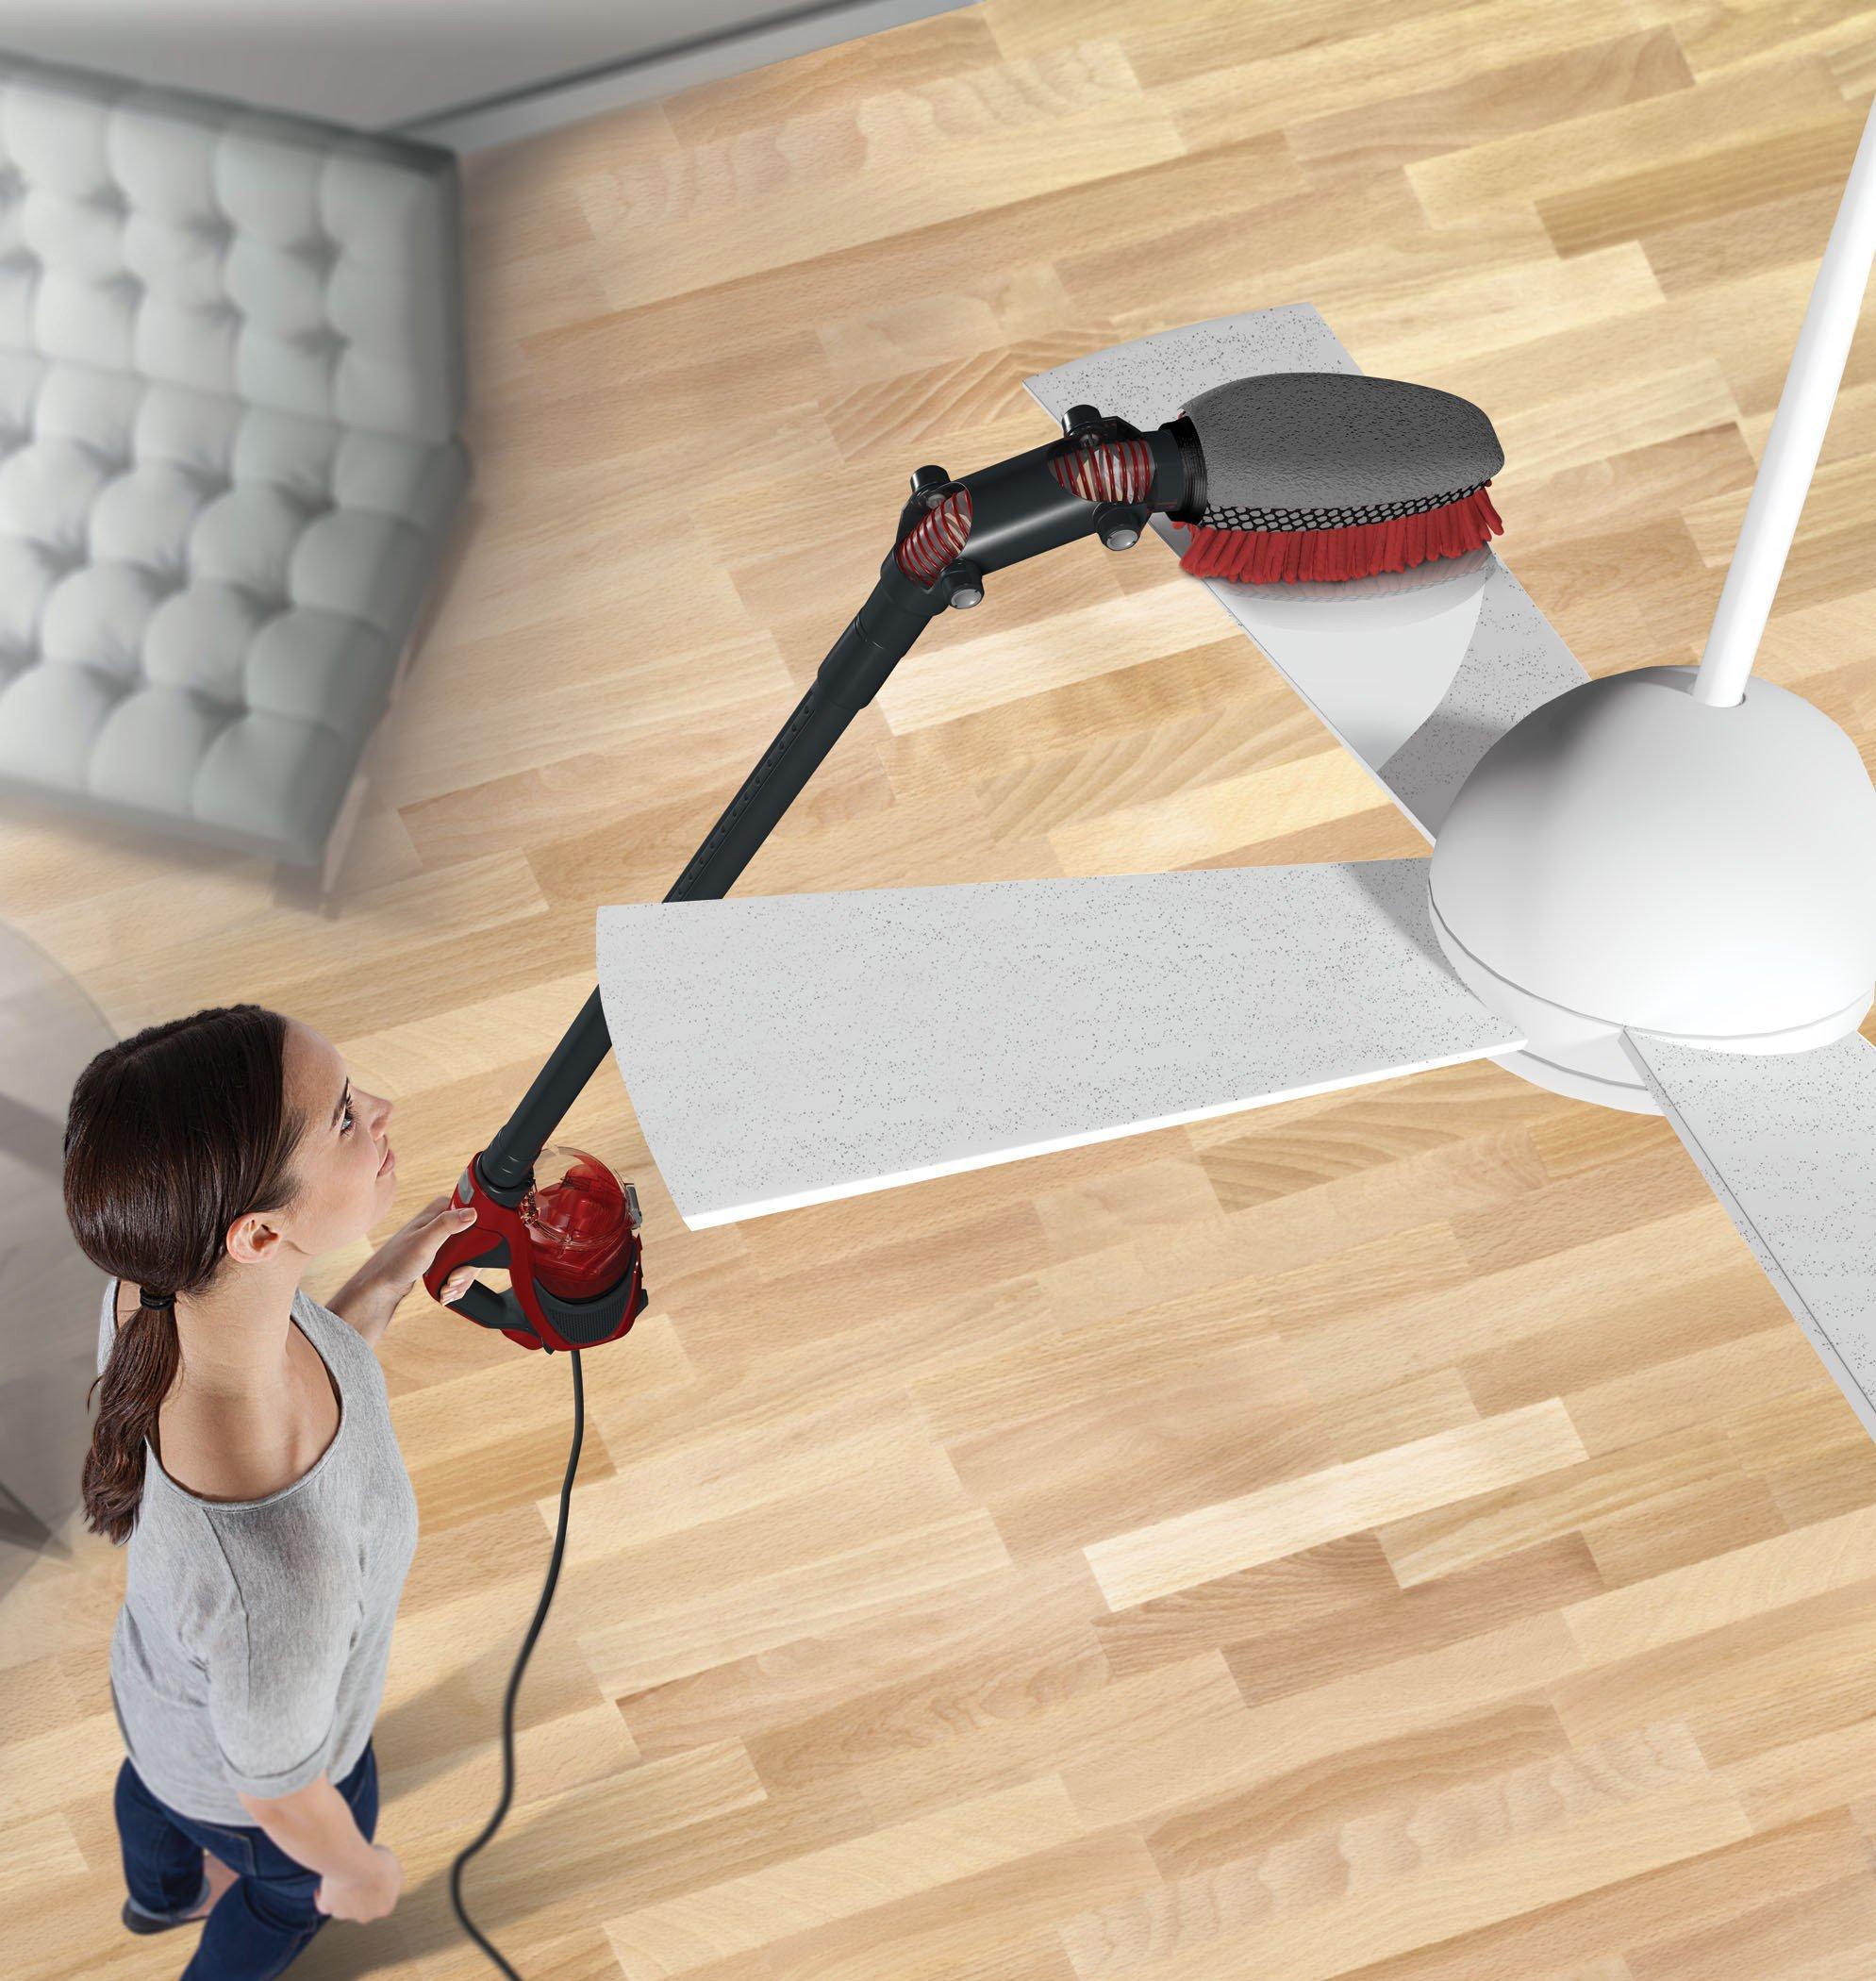 360° Reach Power Corded Stick Vacuum6